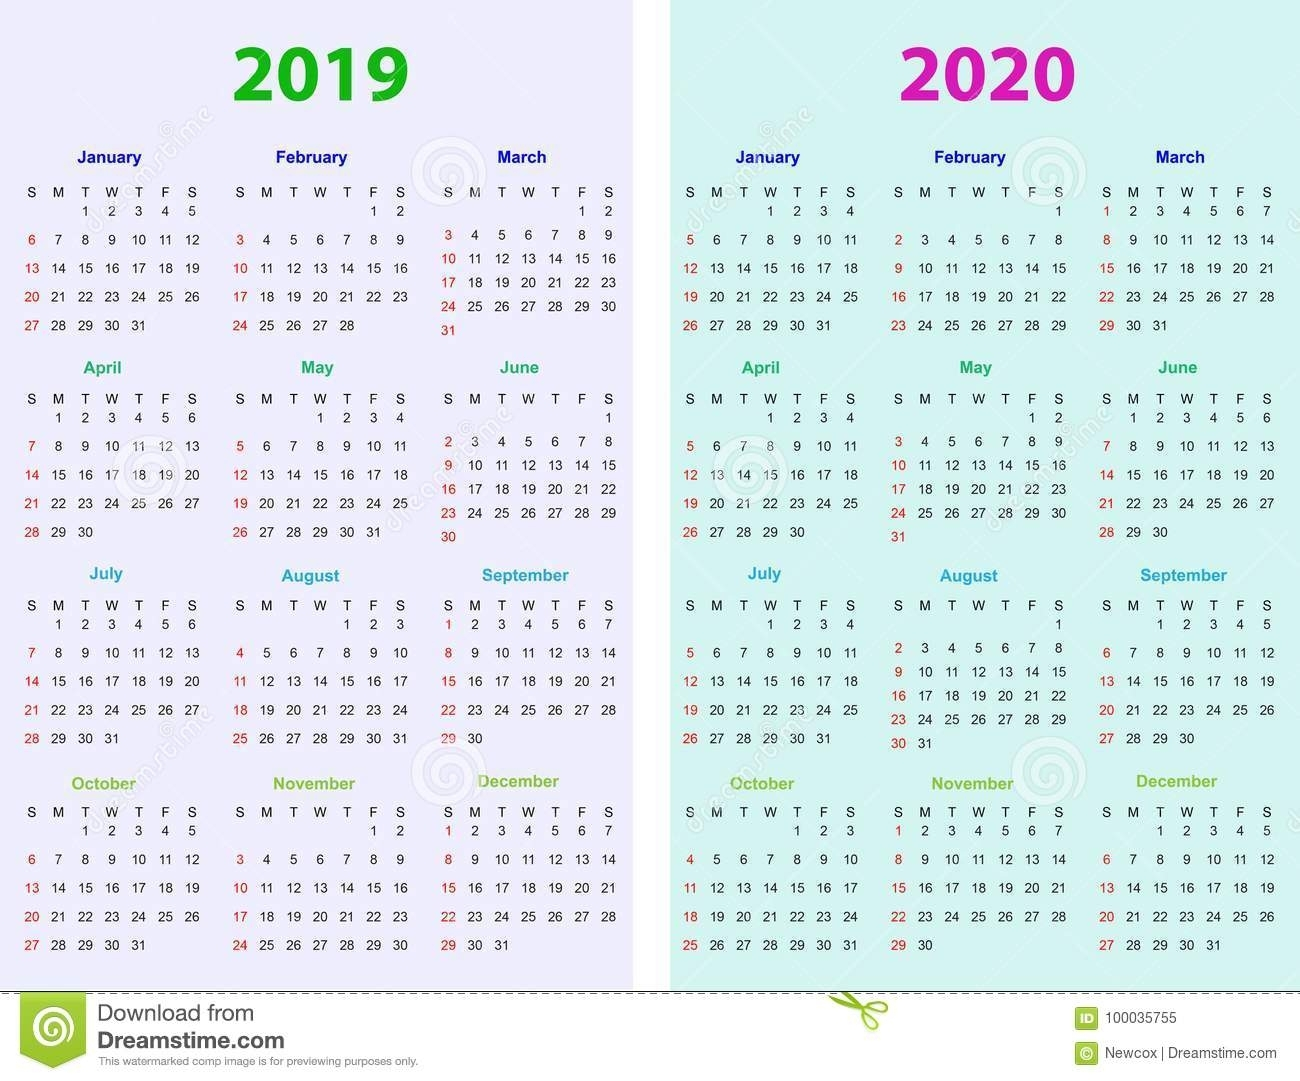 12 Months Calendar Design 2019-2020 Stock Vector - Illustration Of regarding Free Editable Calander 2019-2020 Start On Sunday